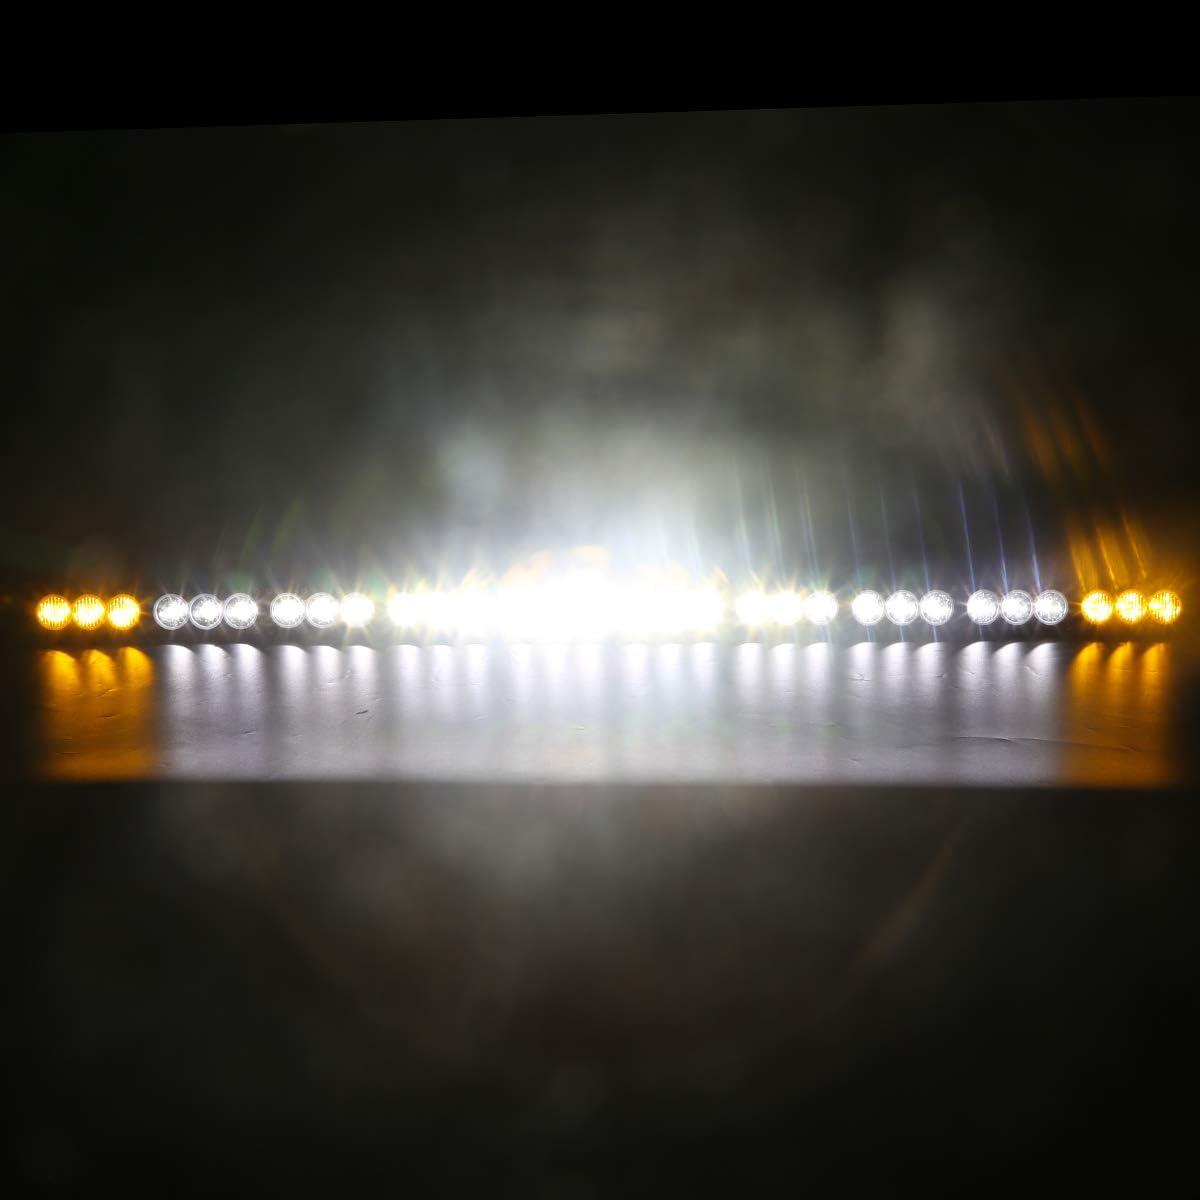 LED Light Bar 6 Inch 30w Amber Len LED Work Light Spot Flood Combo Led Driving Lights Boat Lighting Fog Lights Offroad,Suv 4wd Truck Heavy Duty Vehicle Atv Lights